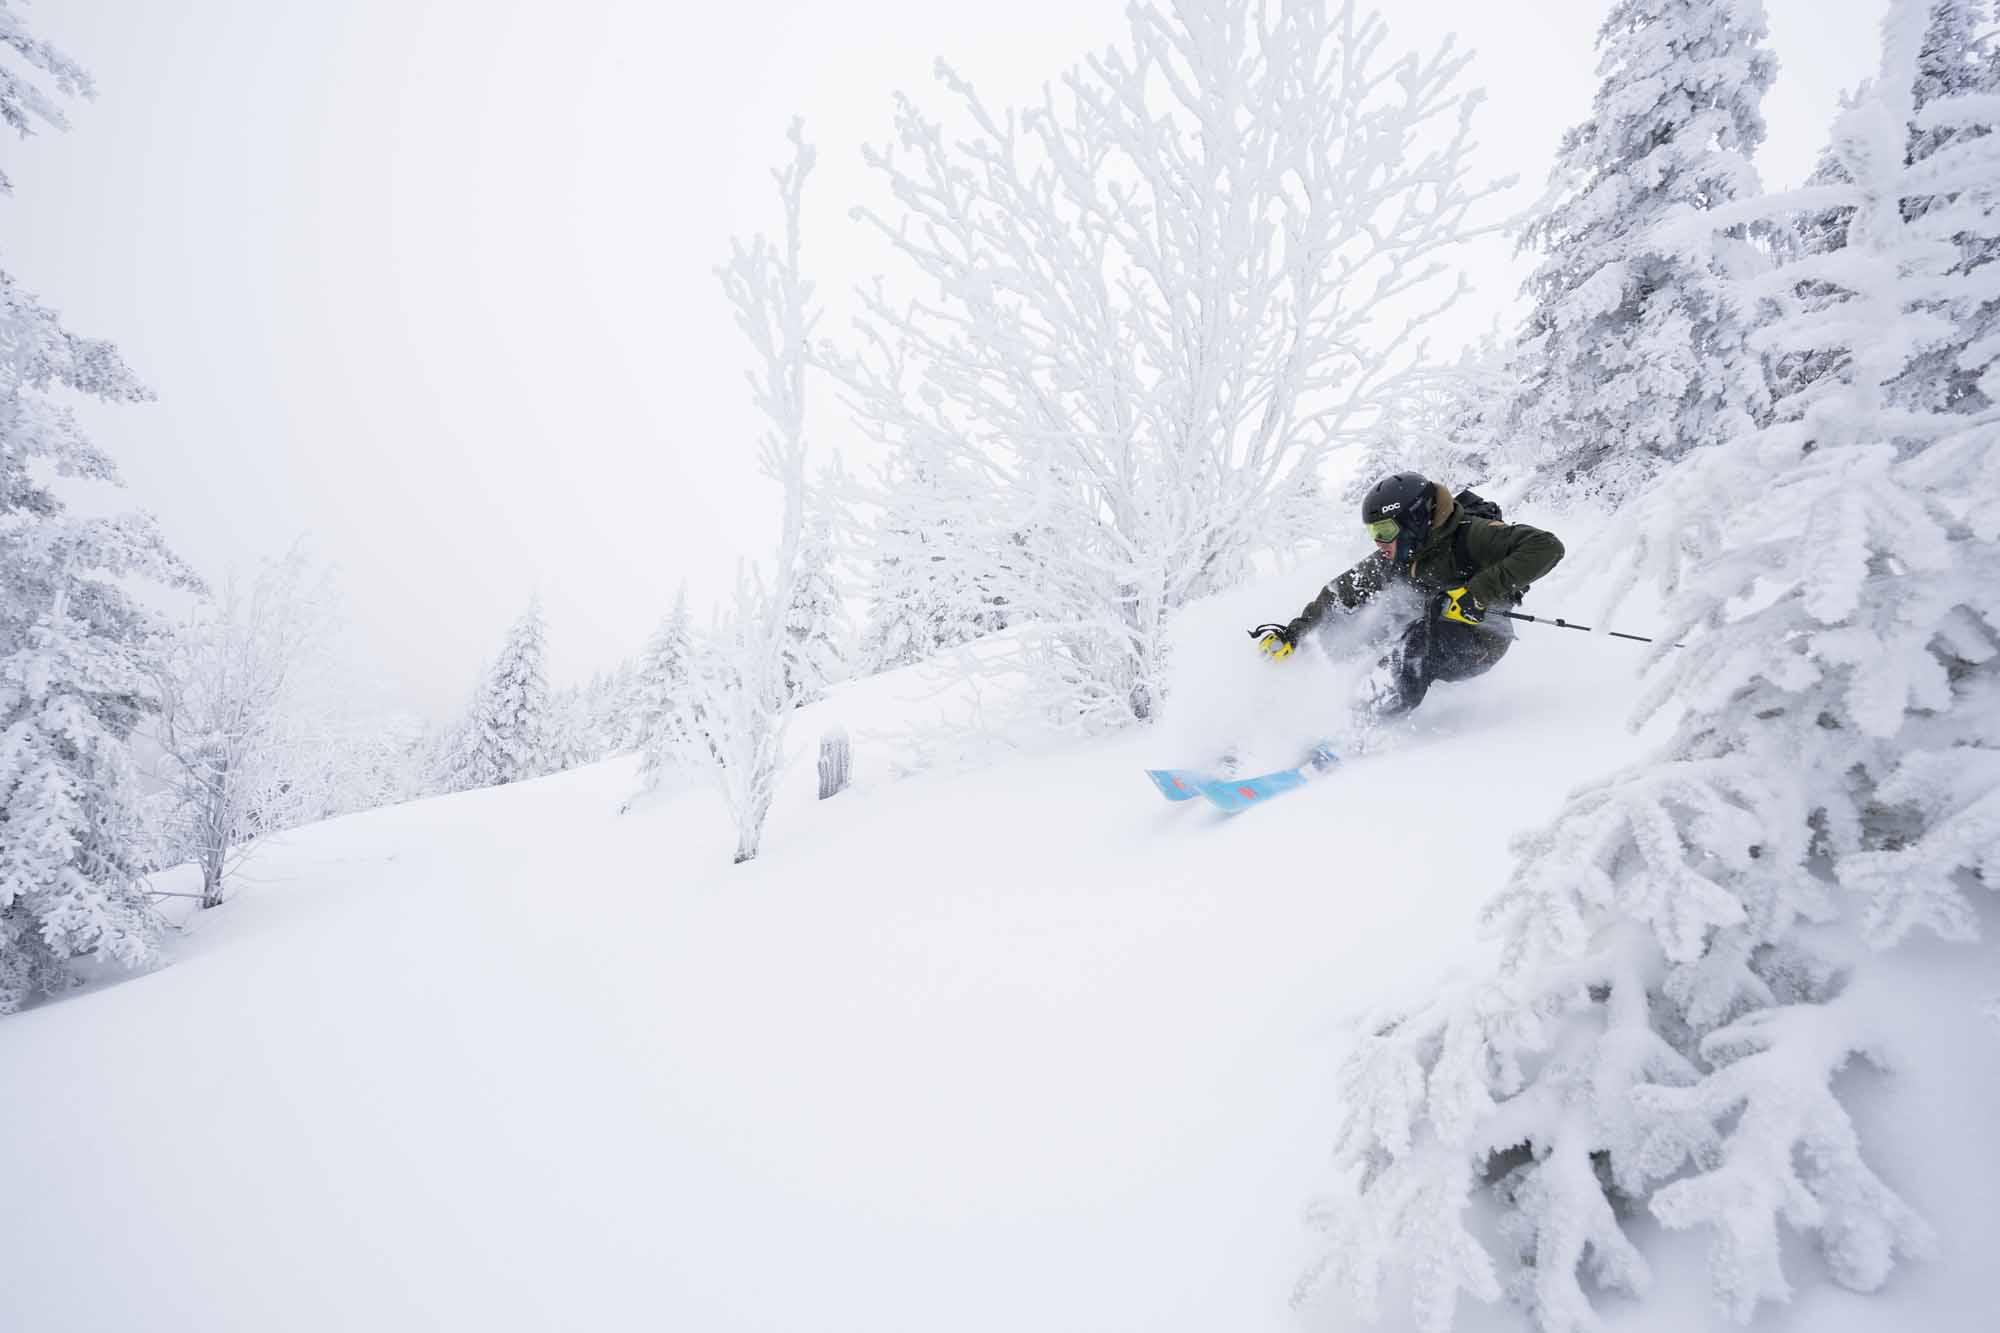 Quebec-Winter-Showcase-Skier-Jean-Philippe-Pelletier-photo-by-ALAIN-DENIS